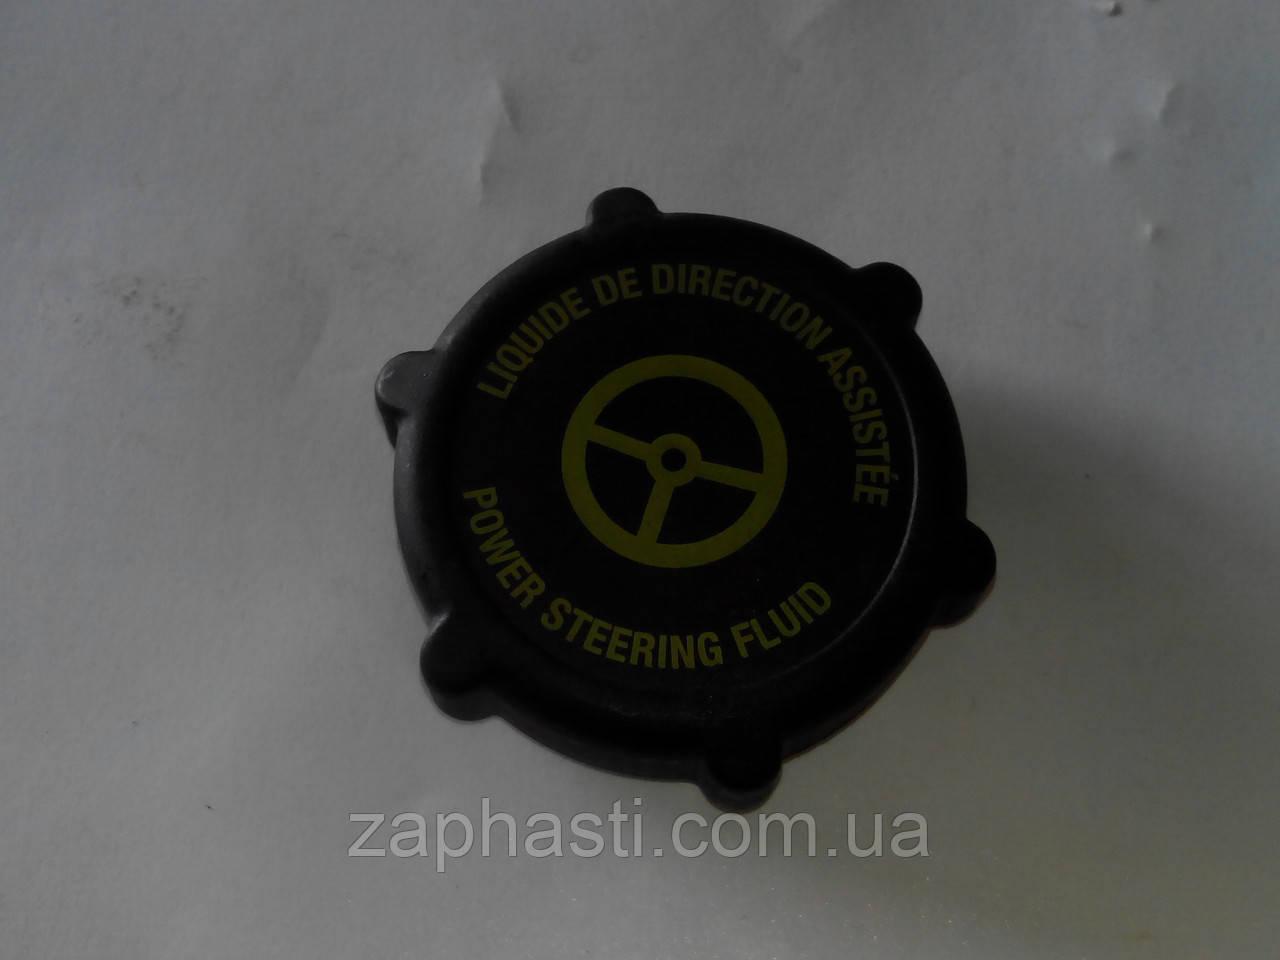 Крышка бачка гидроусилителя форд фокус 2 - Форд Сервис Борщаговка в Киеве